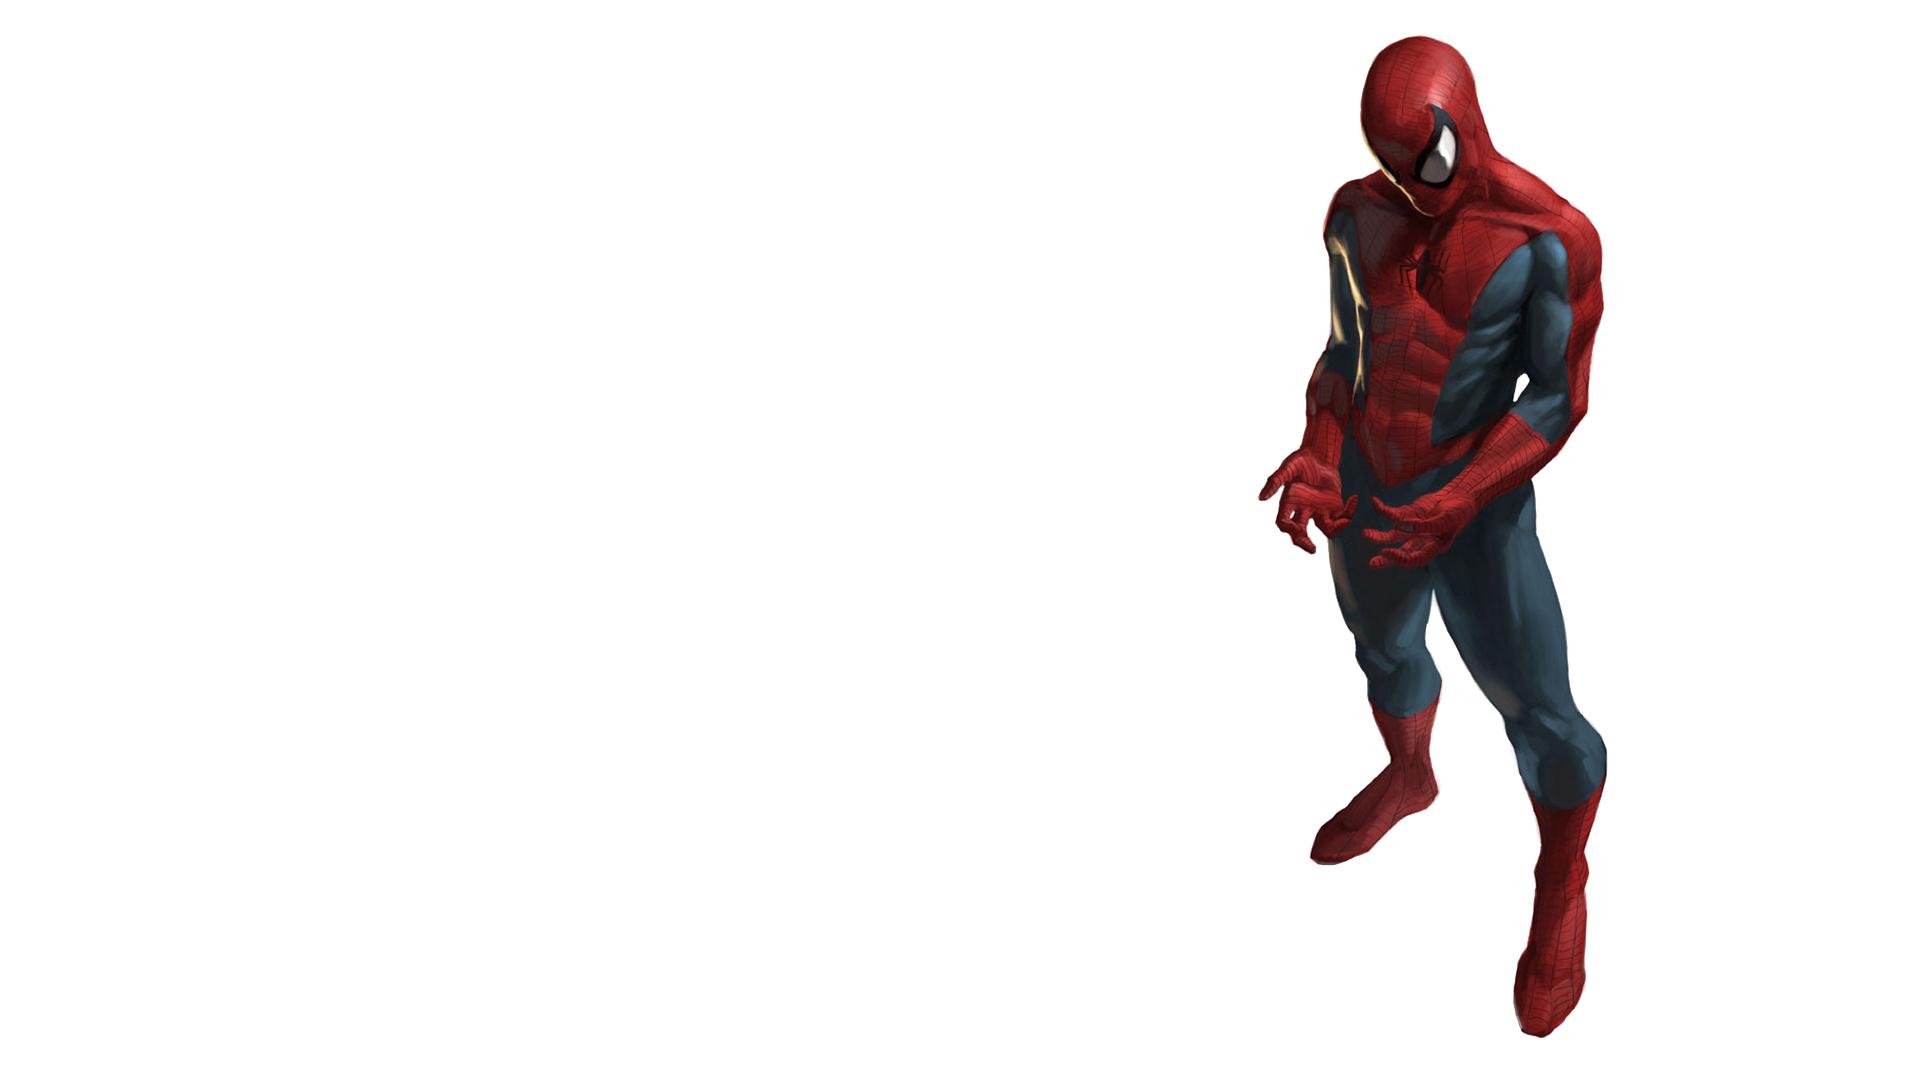 marvel comics wallpaper spider - photo #25